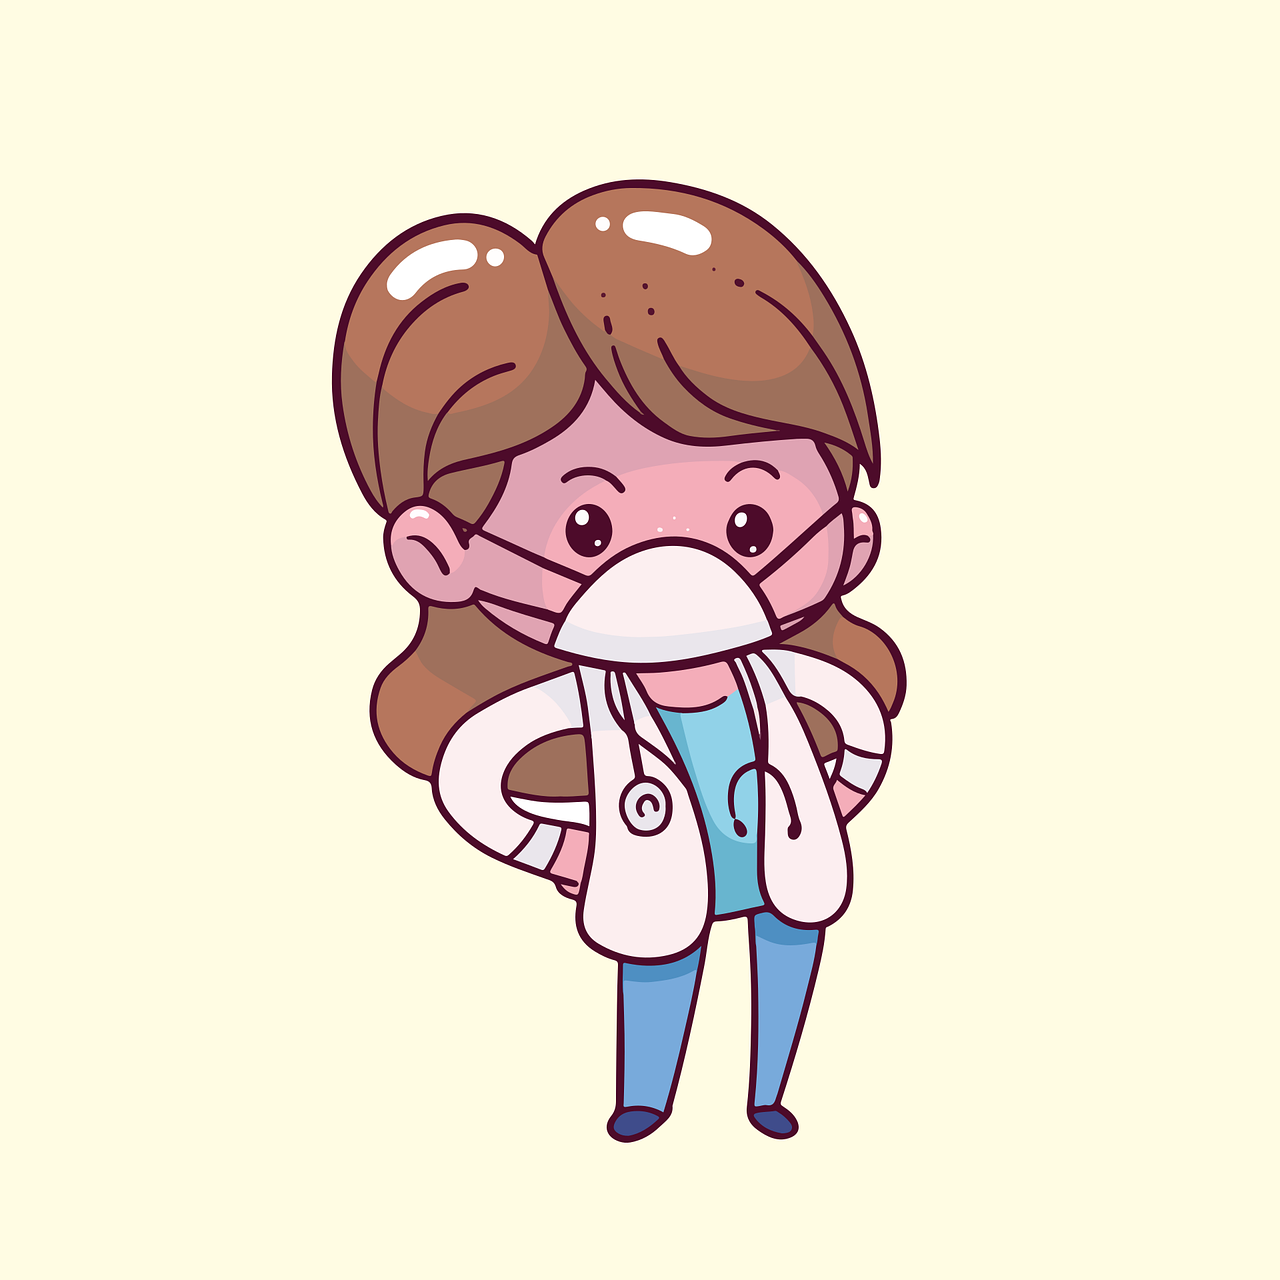 Heeres & Kingma Huisartsenpraktijk diagnose burnout huisarts